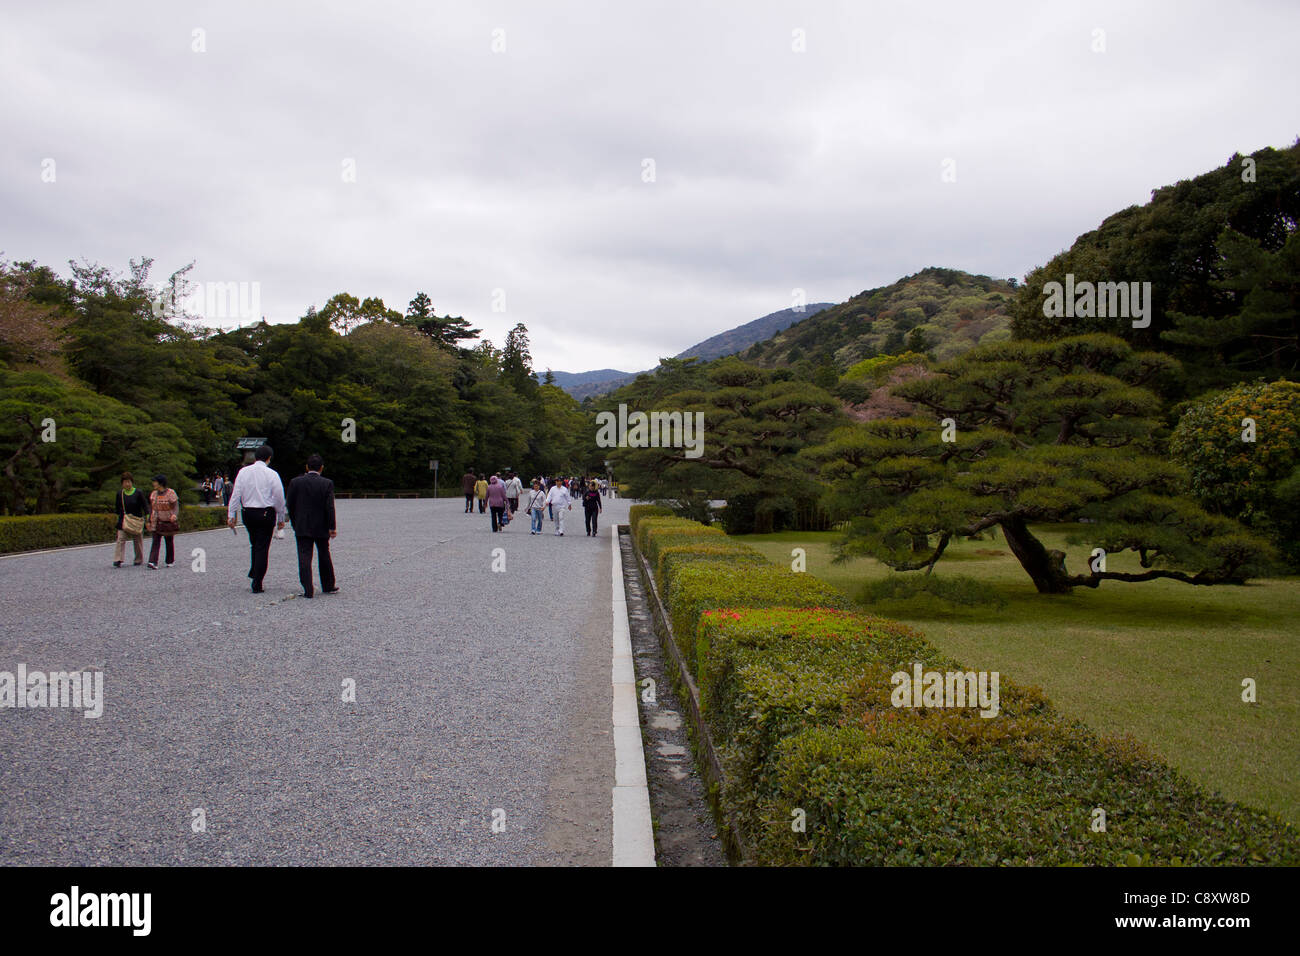 Stunning gardens at Ise Grand Shrine, Japan. - Stock Image